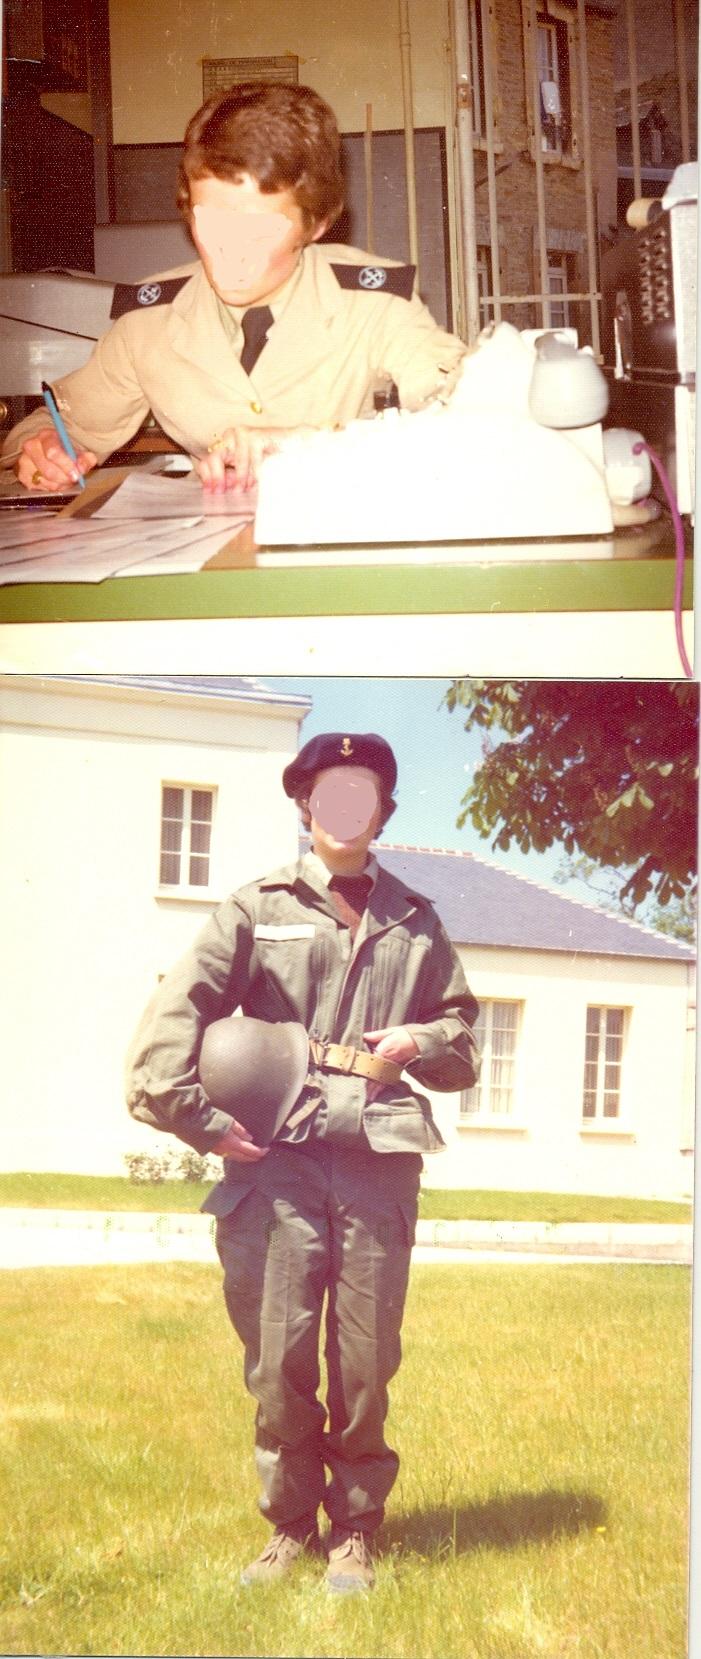 [LES TRADITIONS DANS LA MARINE] TENUE DANS LA MARINE- TOME 02 - Page 17 Marine10